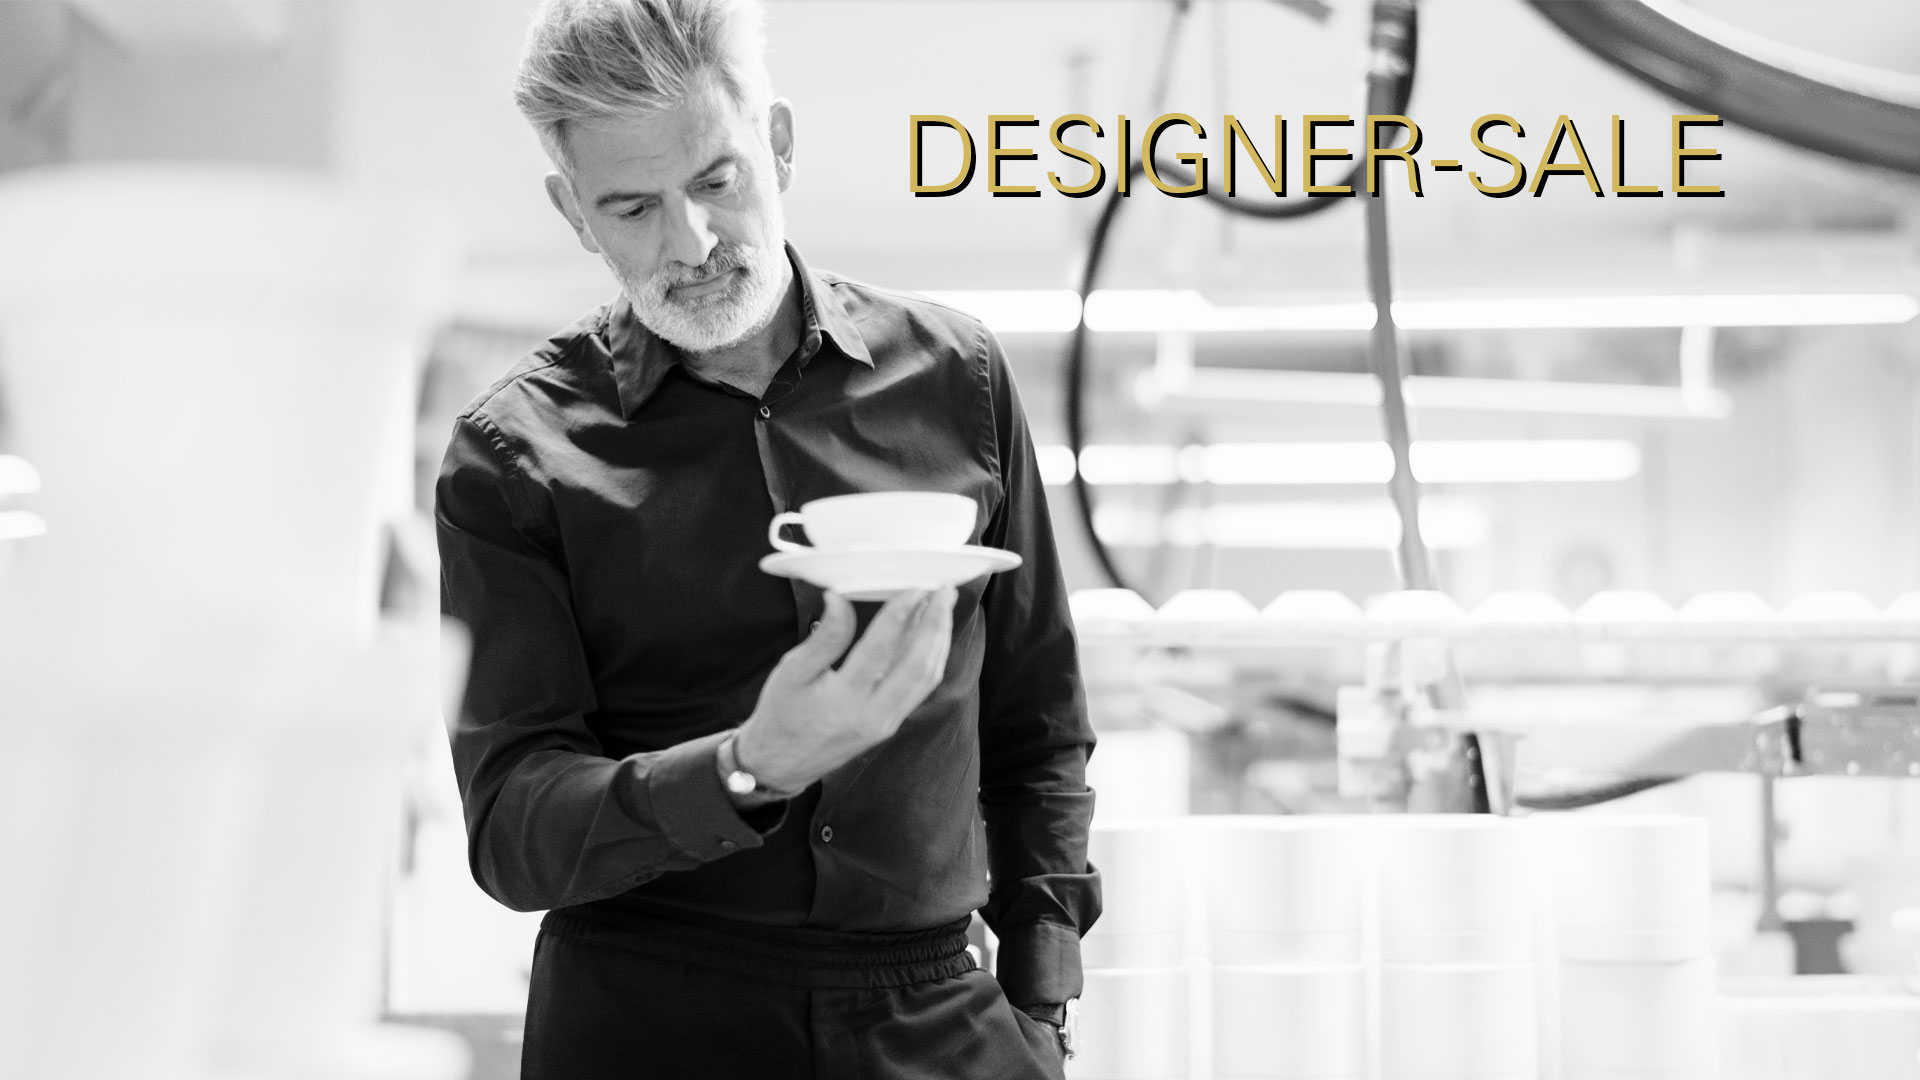 Designer-Sale